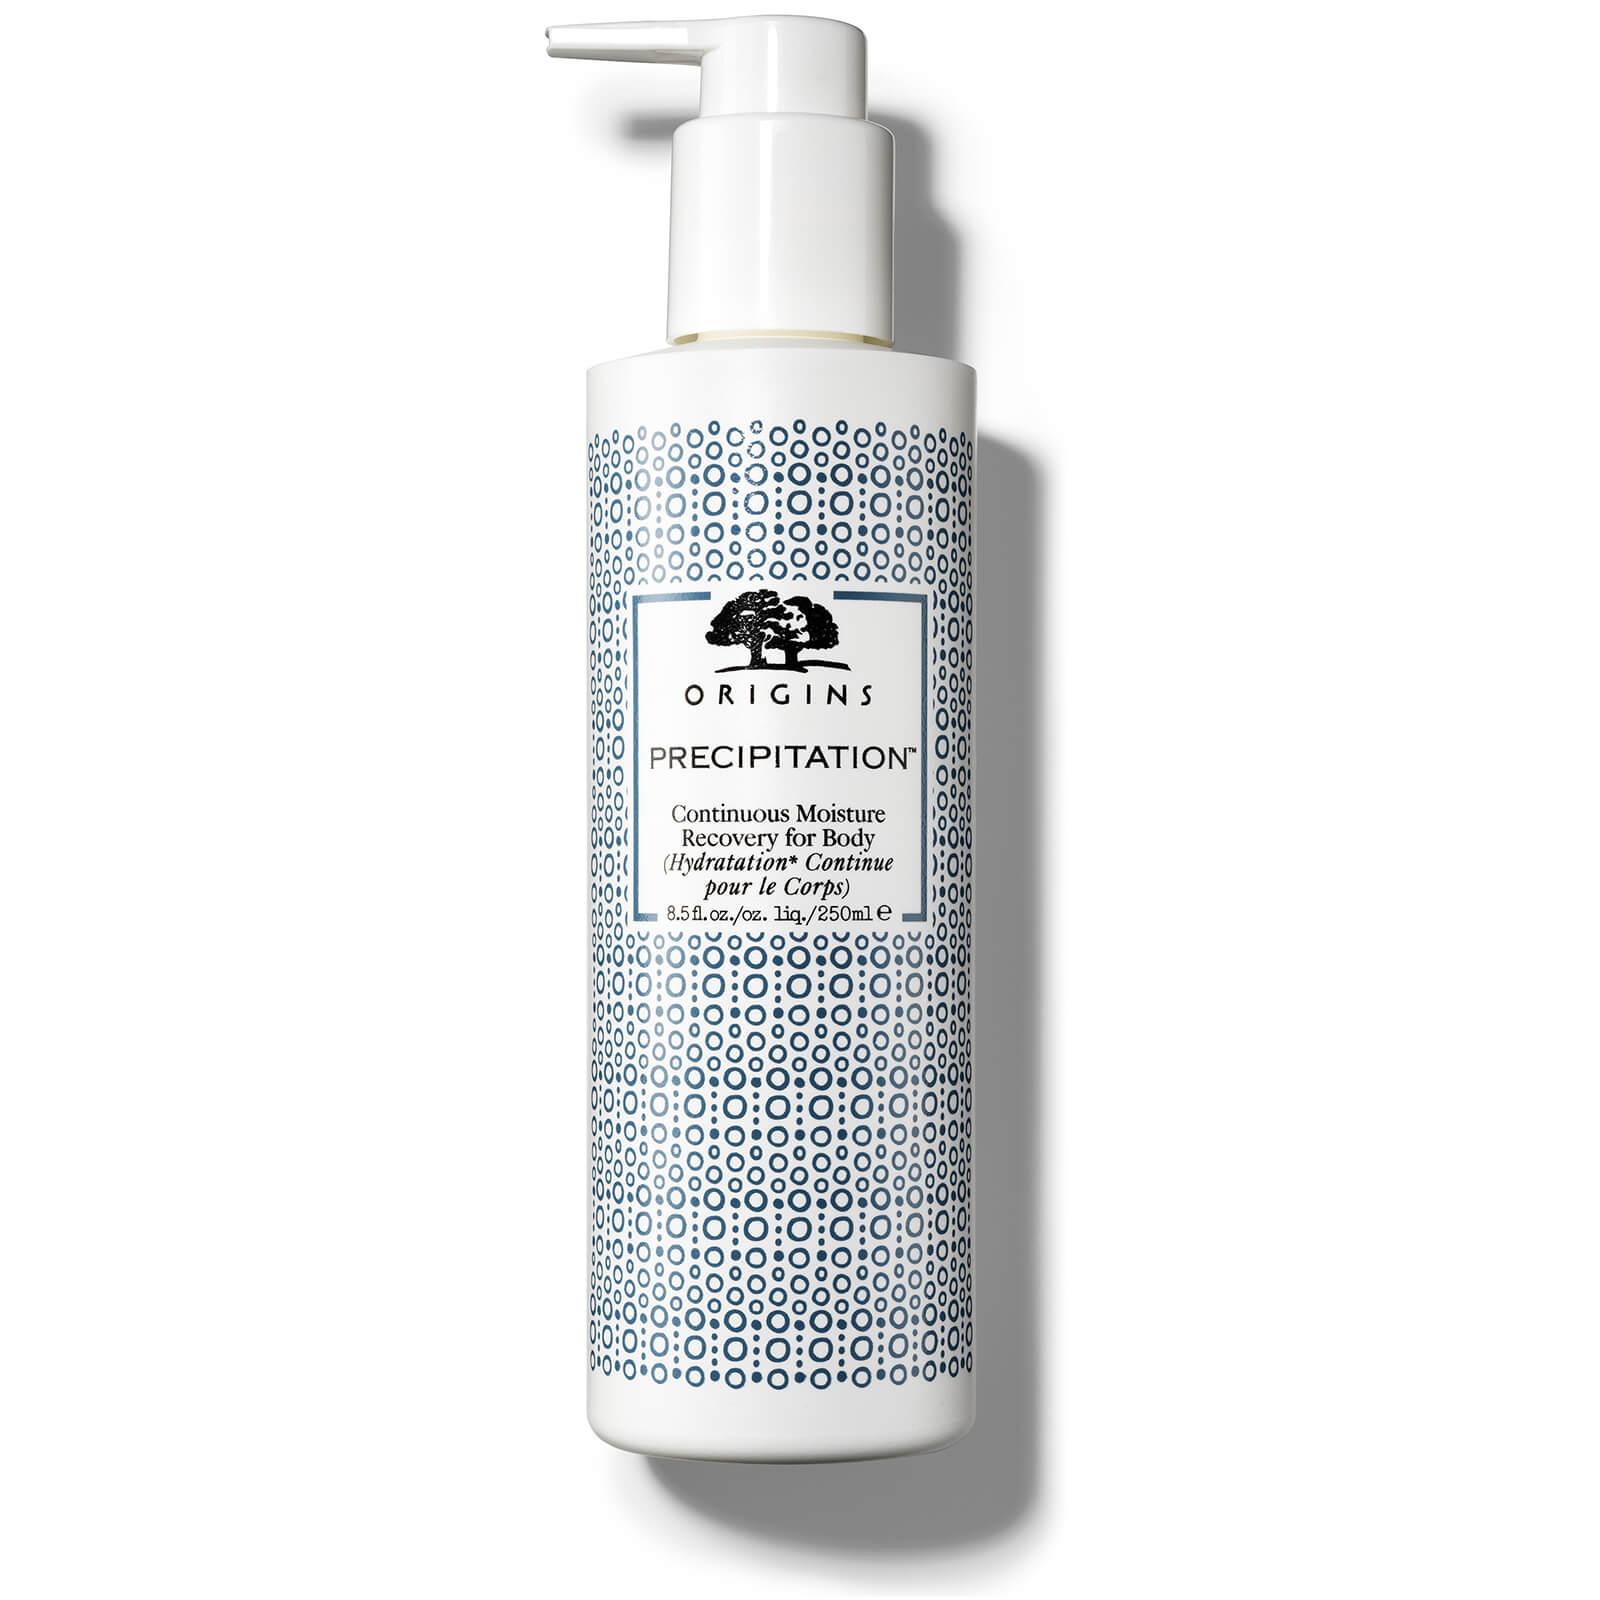 Origins Crema Hidratante  Precipitation™ Extra Continuous Moisture Recovery (200ml)